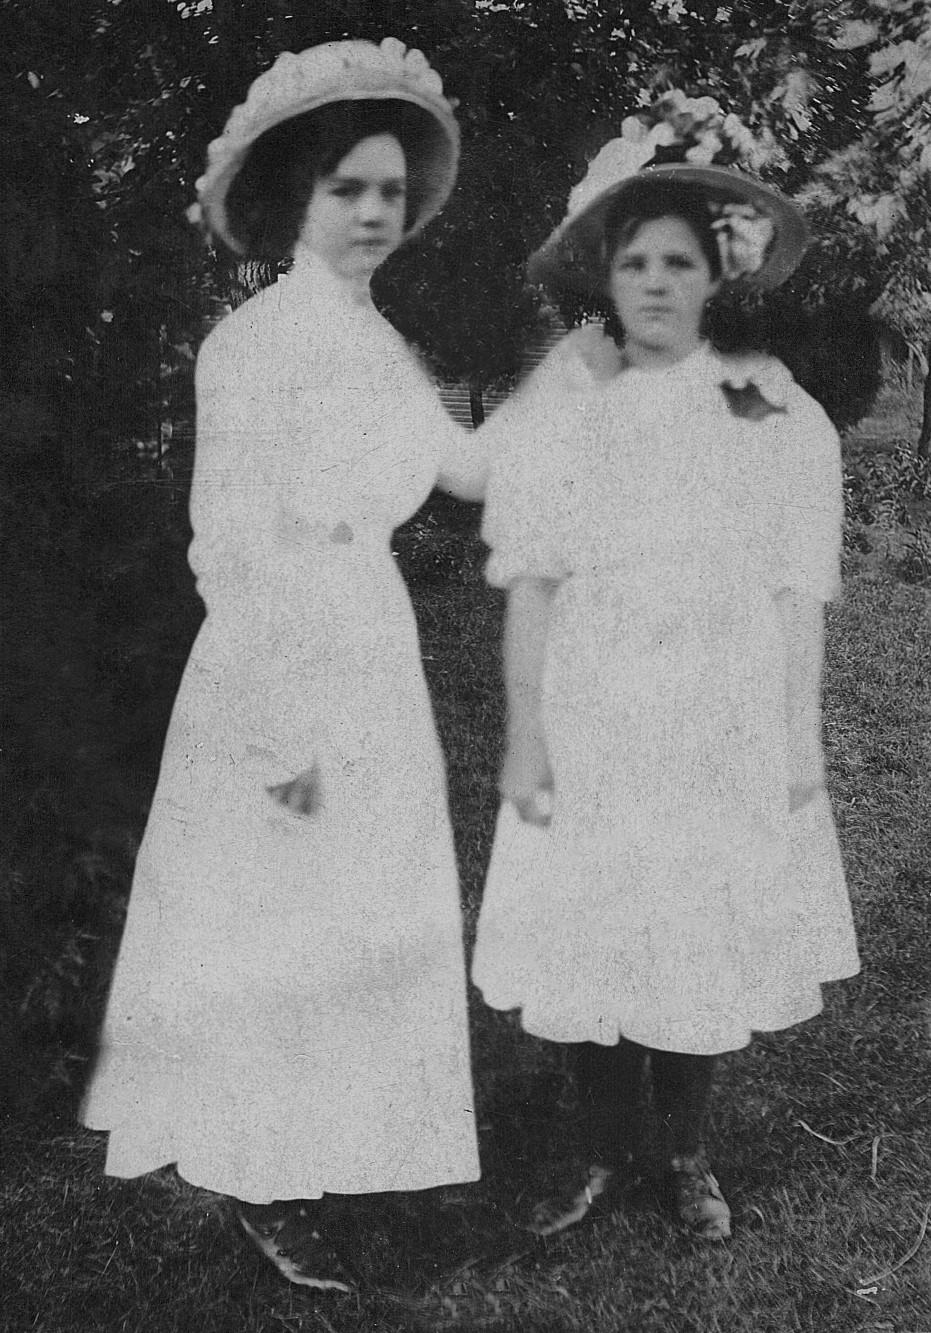 scelian and ruth vining 1911 edited by kristy duggan